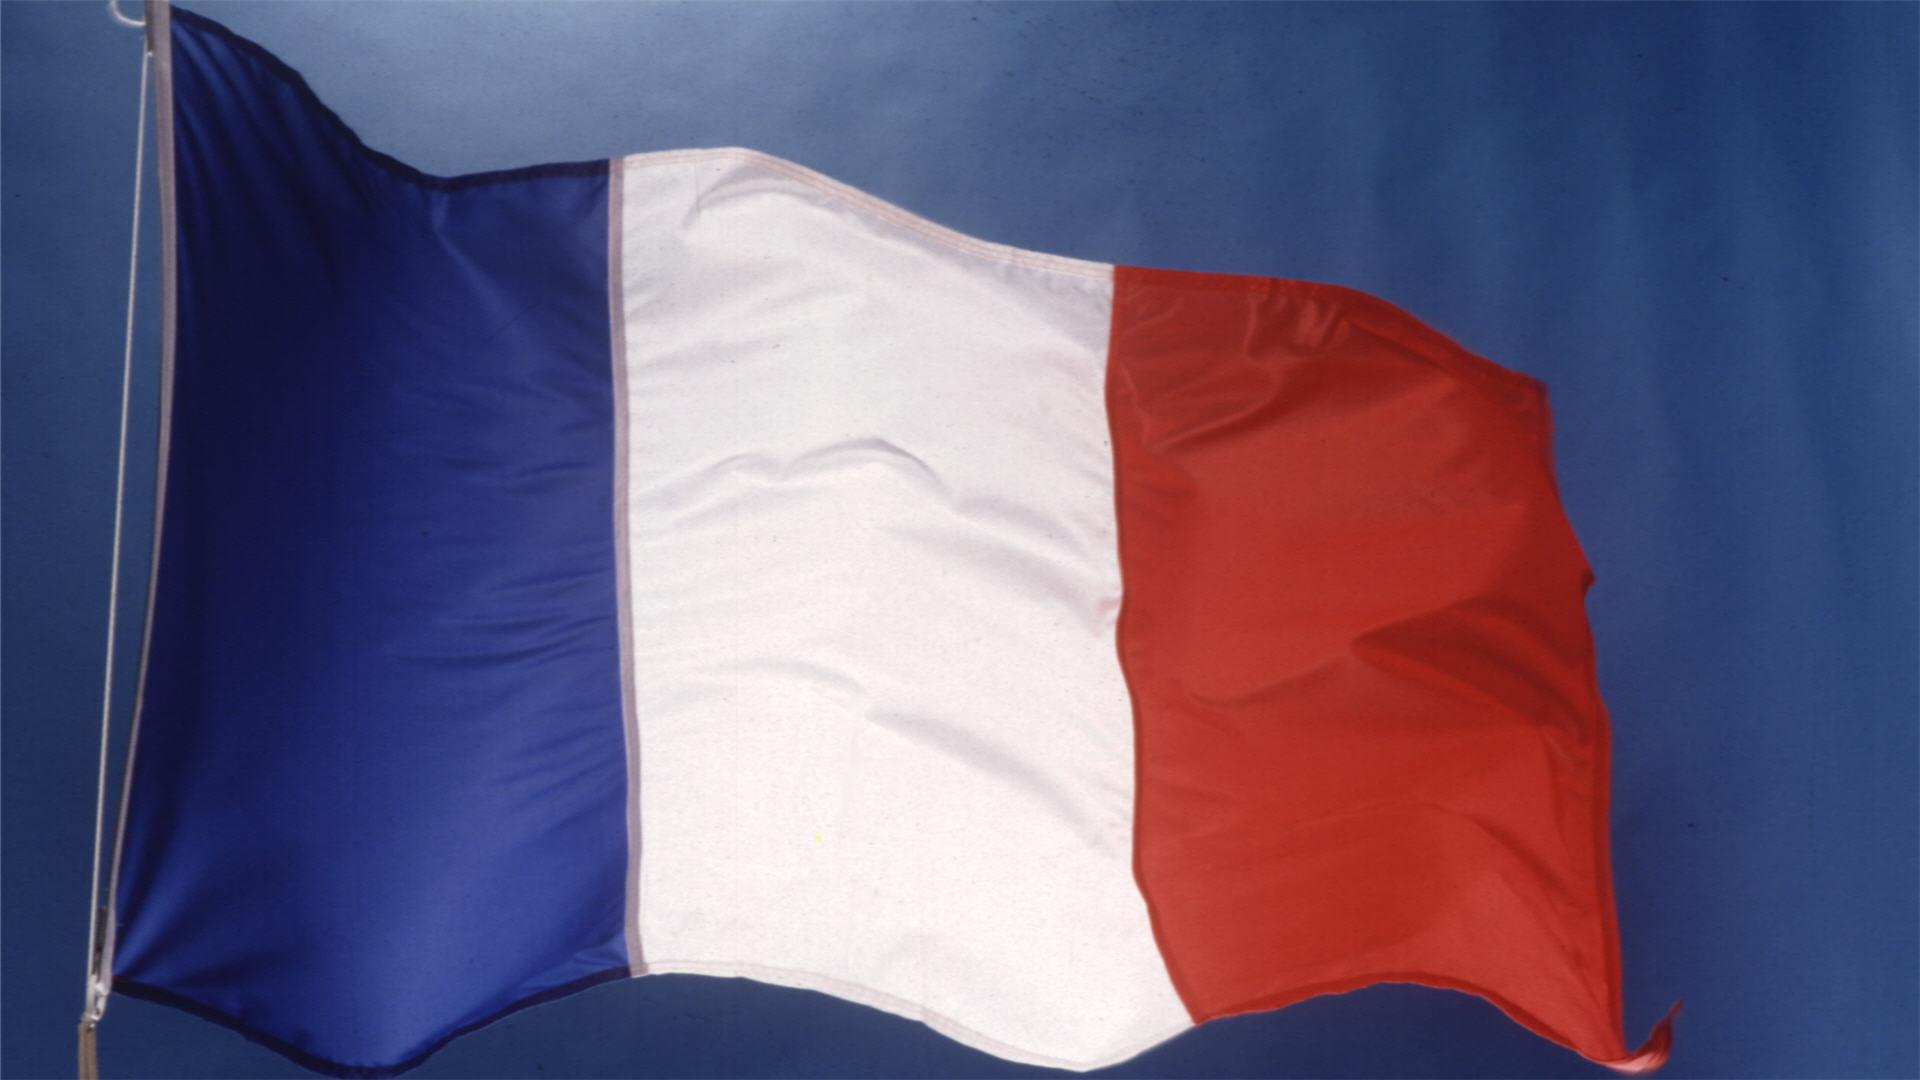 Inspirational Quotes For Desktop Wallpaper Hd French Flag Hd Backgrounds Pixelstalk Net